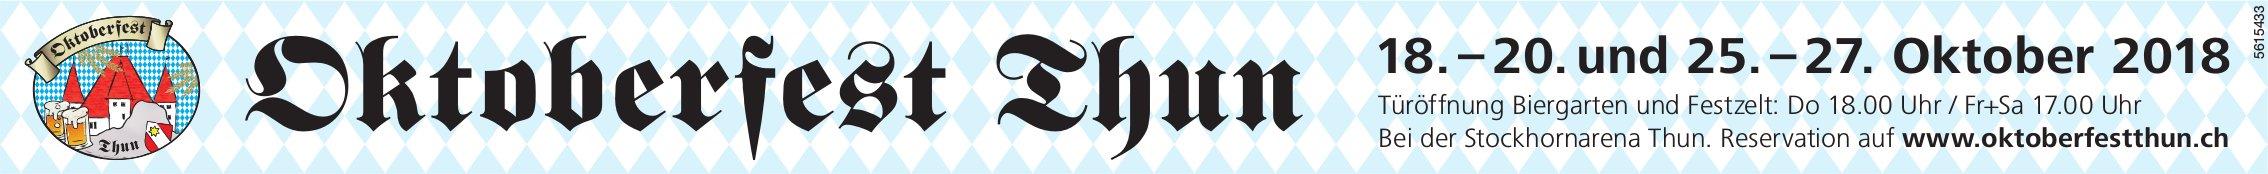 Oktoberfest, 18. - 20. & 25. - 27. Oktober, Thun